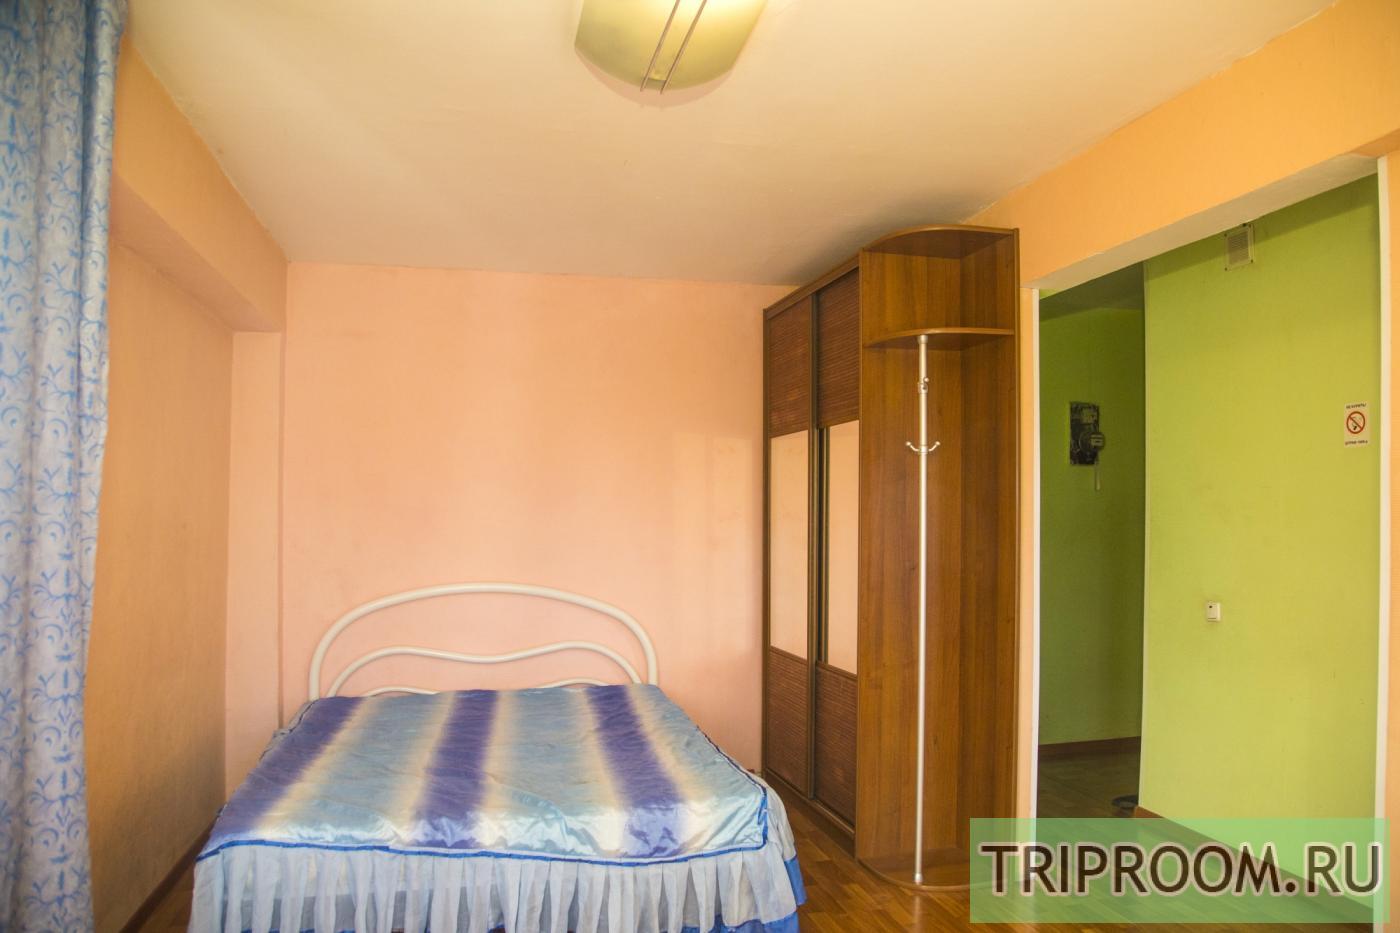 1-комнатная квартира посуточно (вариант № 6615), ул. Александра Матросова улица, фото № 3